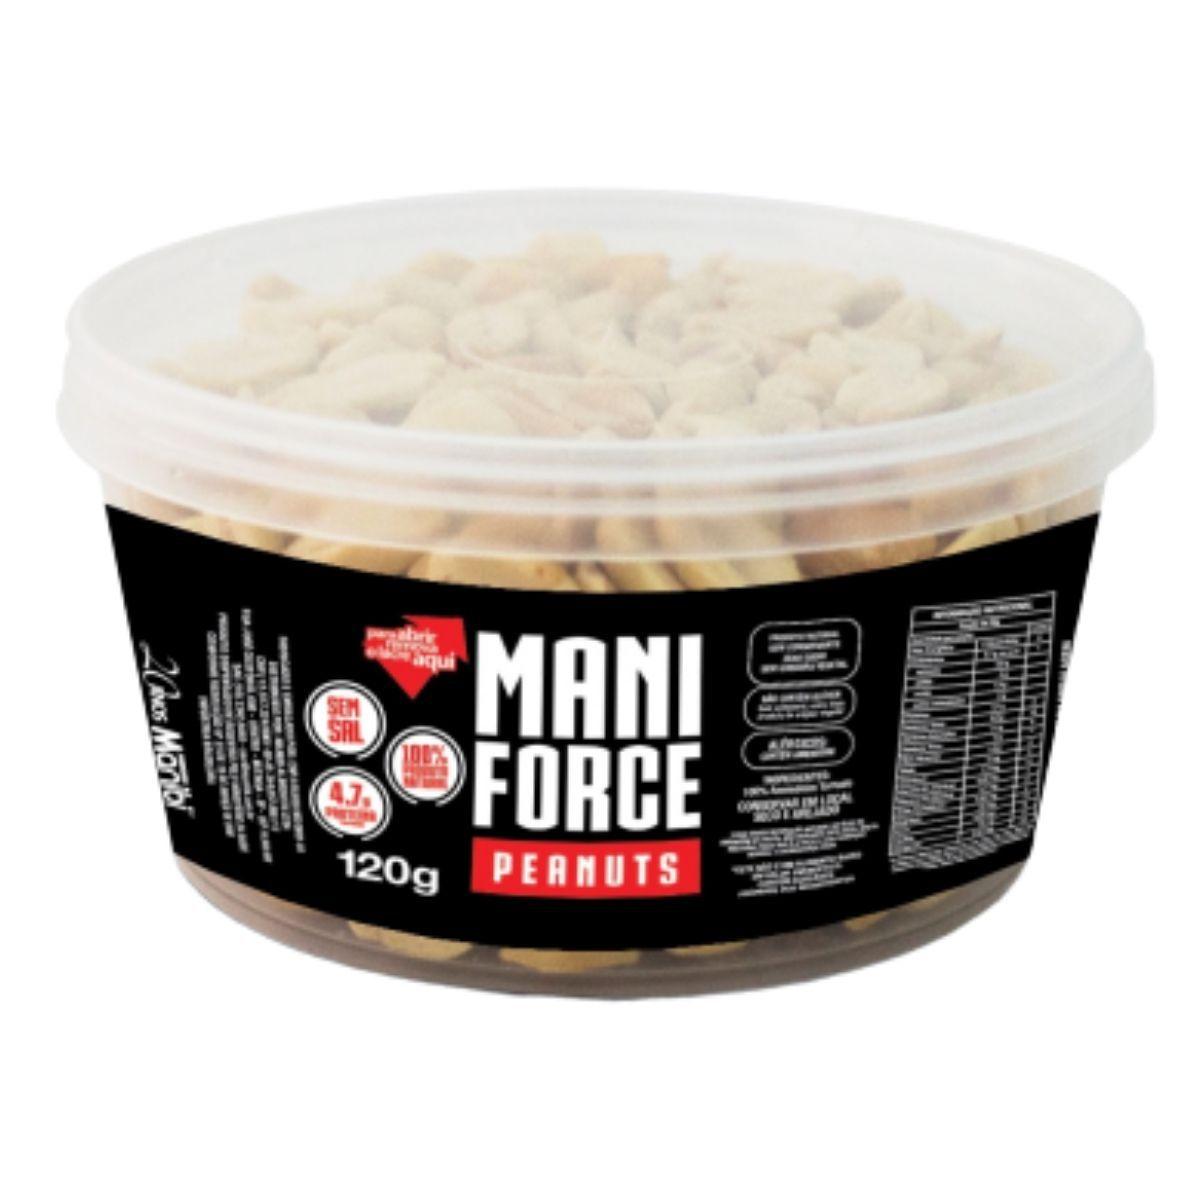 Amendoim Torrado 100% Natural Peanuts Sem Sal Mani Force 120g - Manibi